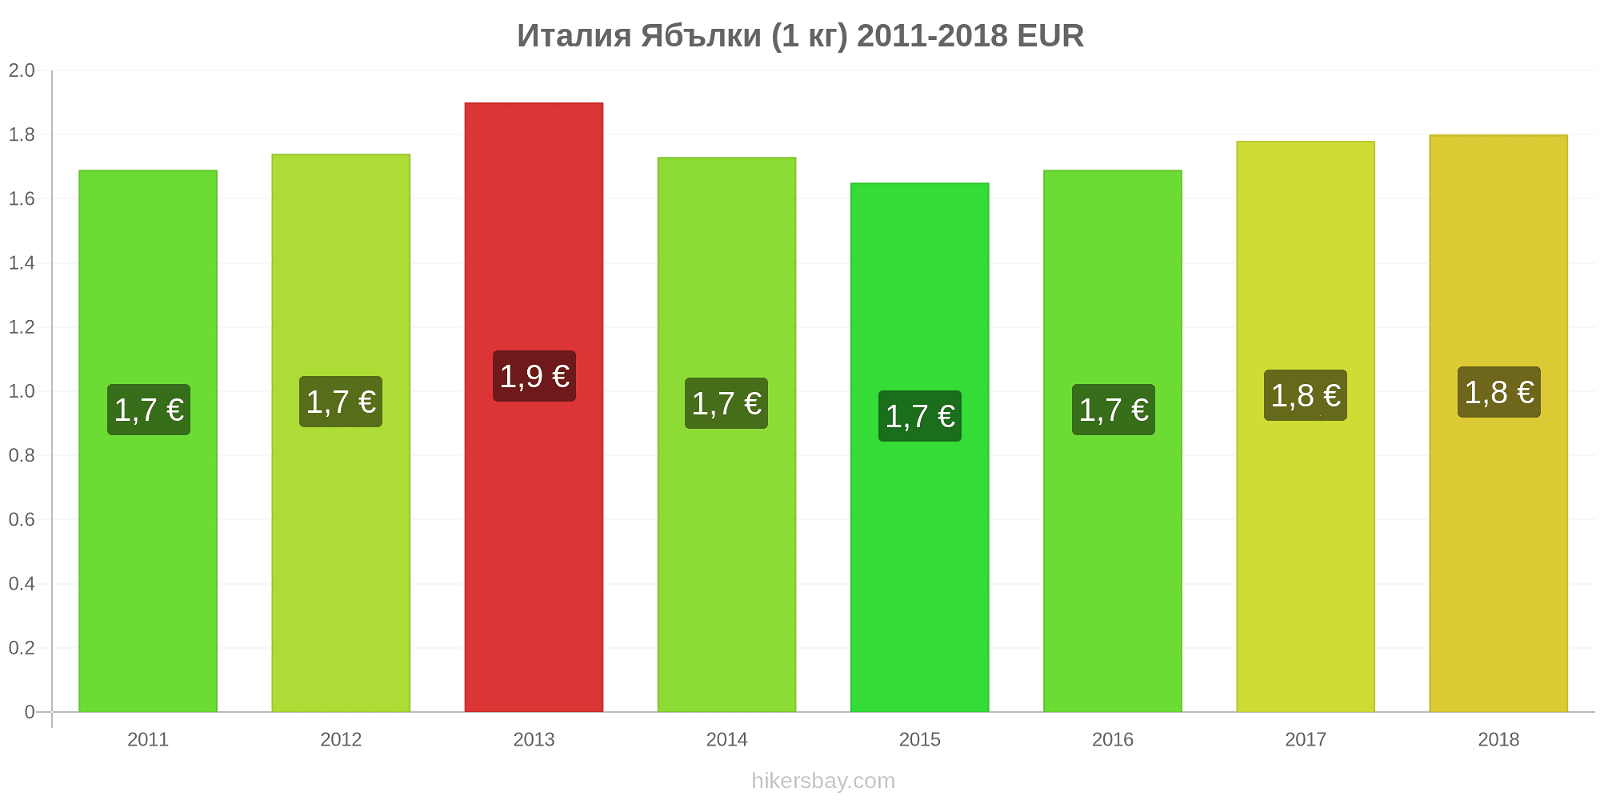 Италия ценови промени Ябълки (1 кг) hikersbay.com